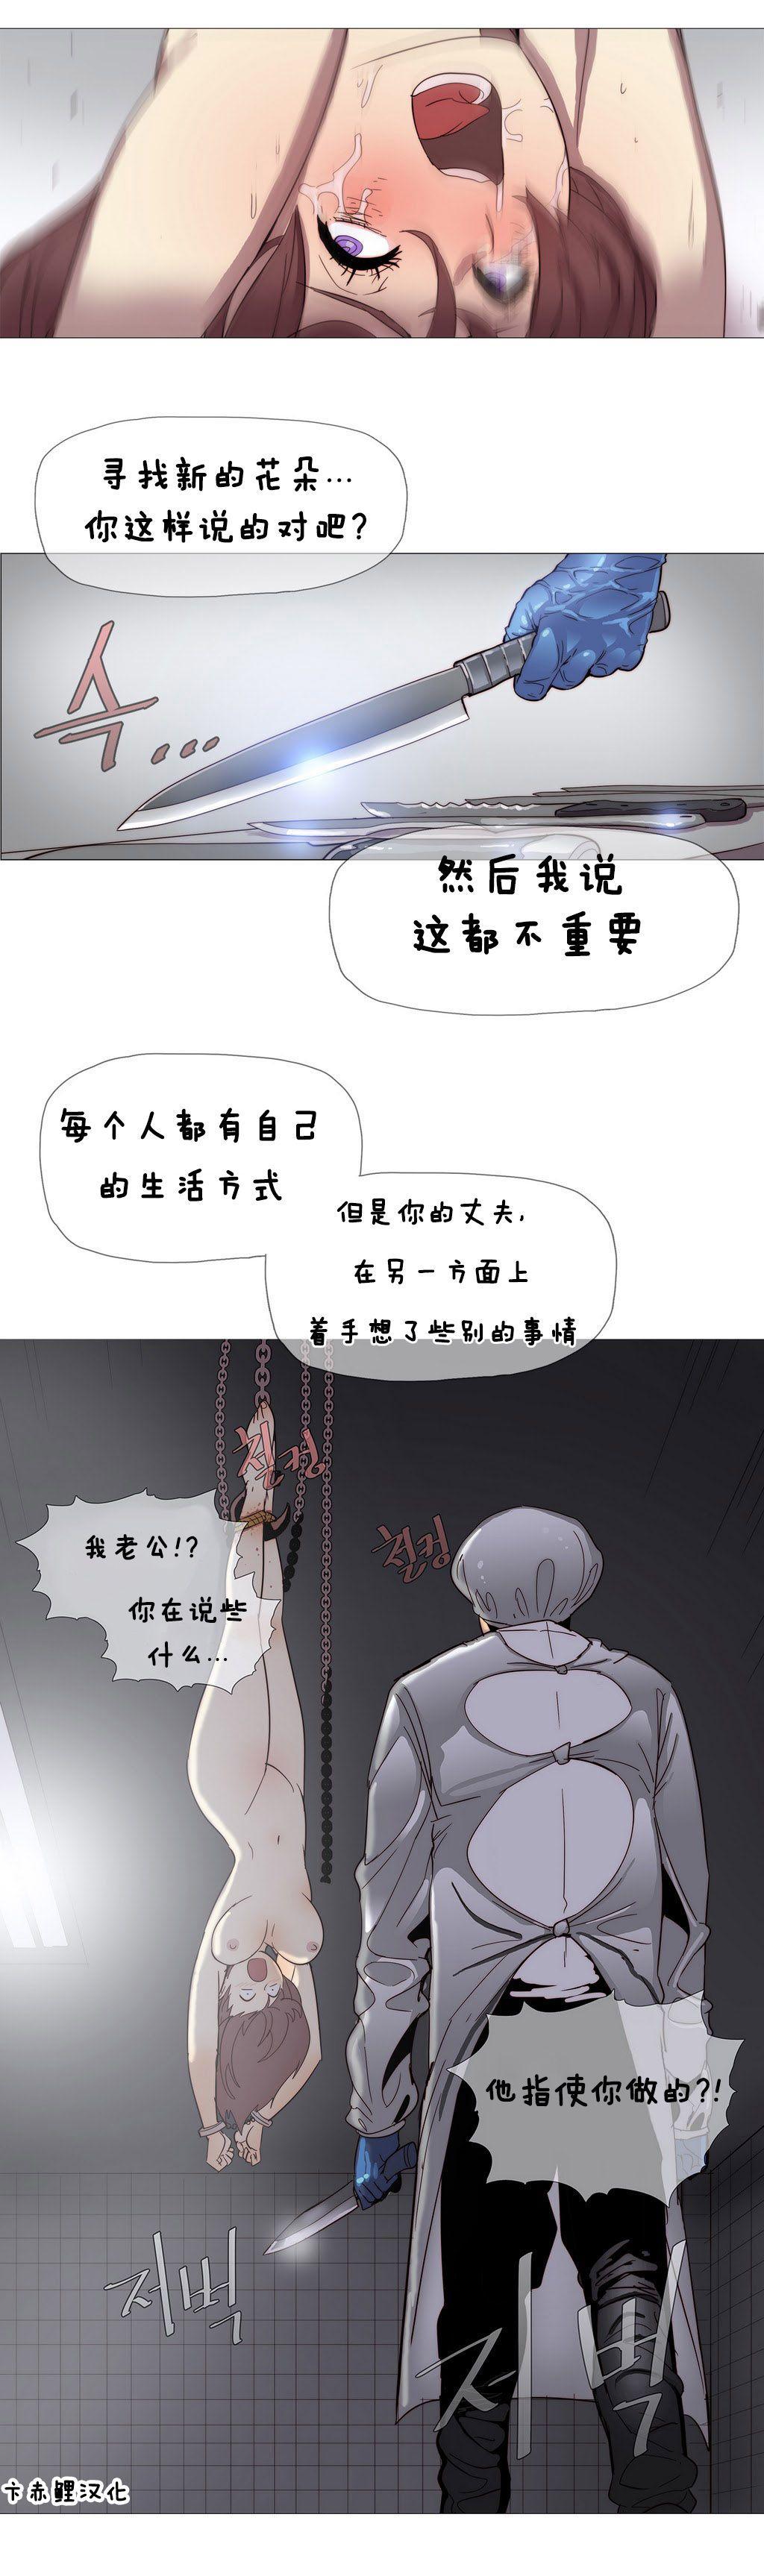 HouseHold Affairs 【卞赤鲤个人汉化】1~21话(持续更新中) 40